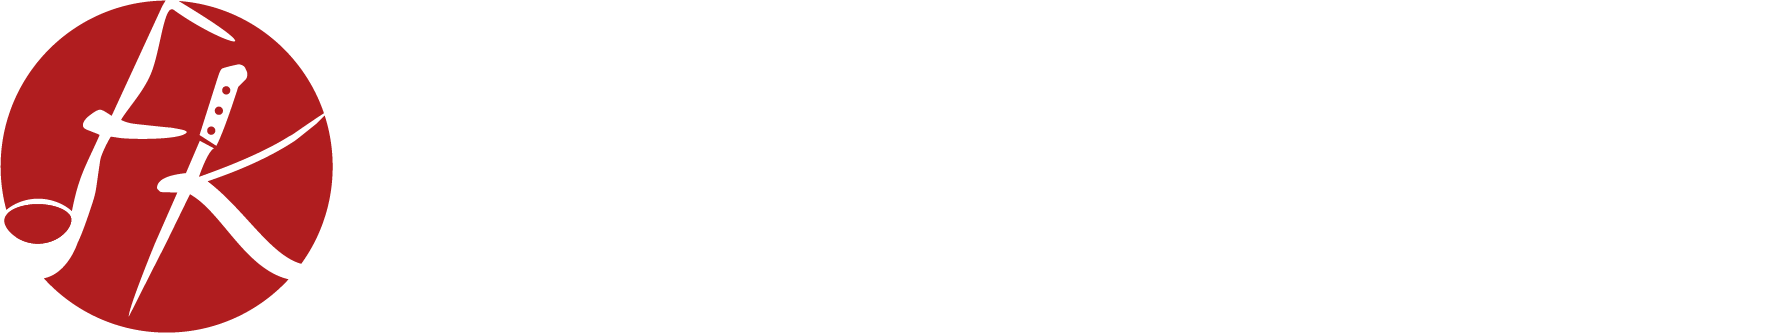 FD-rect-white